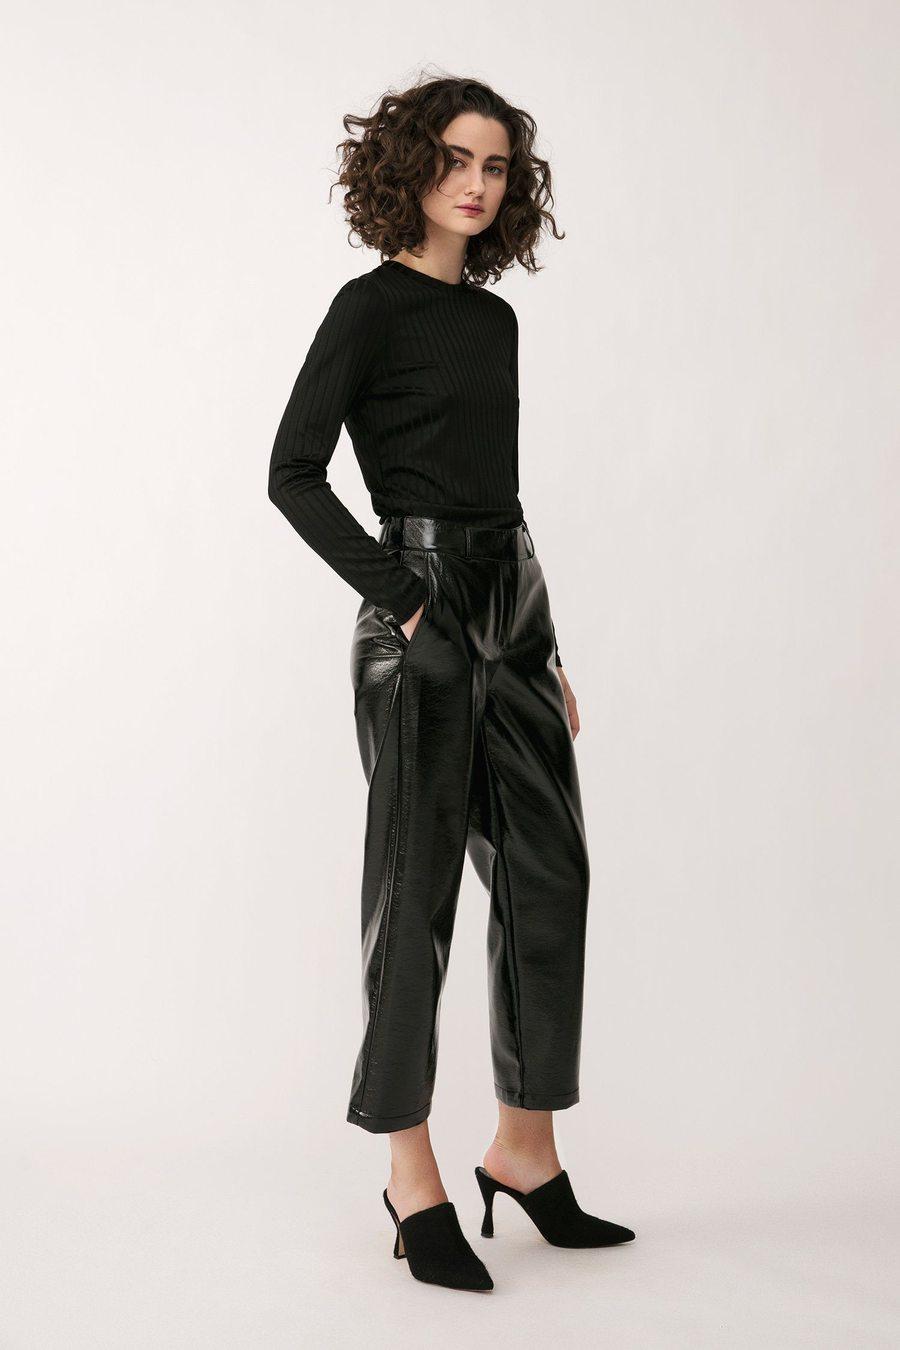 verde-trousers-black-trousers-stylein-420385_900x.jpg